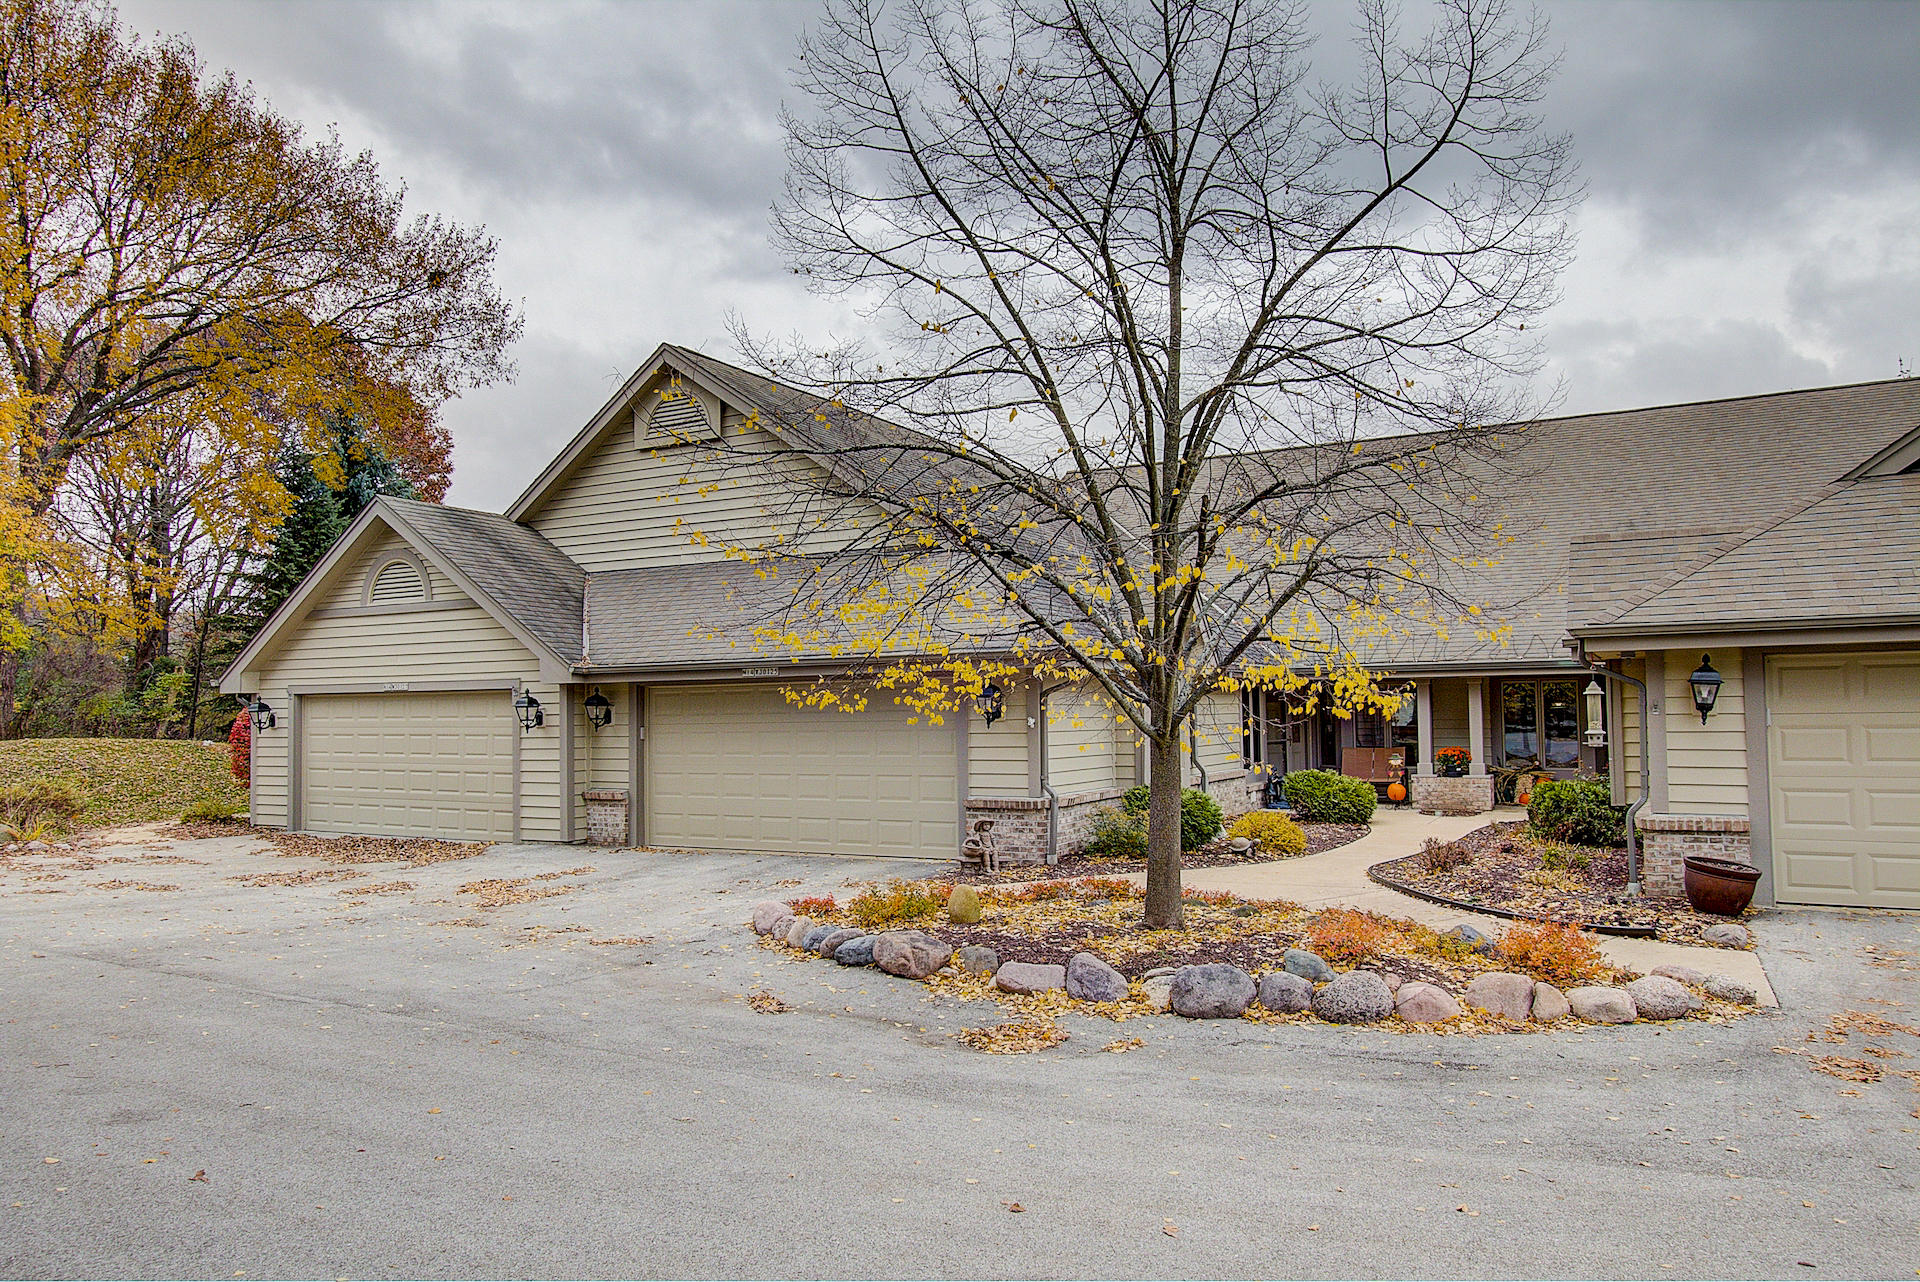 N14W30125 High Ridge Rd, Delafield, Wisconsin 53072, 3 Bedrooms Bedrooms, 9 Rooms Rooms,2 BathroomsBathrooms,Condominiums,For Sale,High Ridge Rd,1,1613024